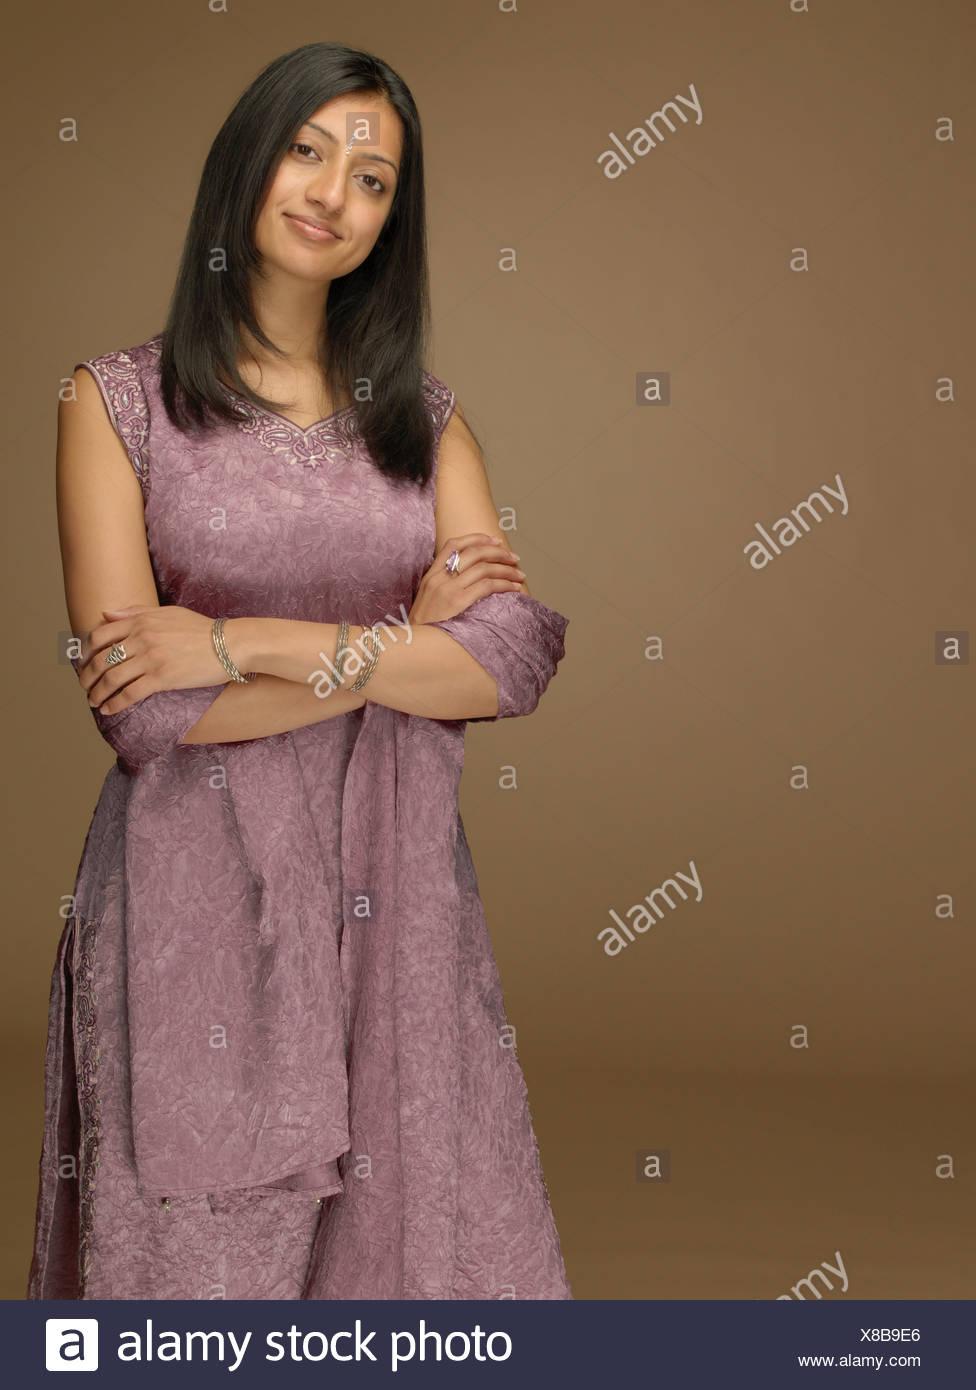 Woman wearing a sari - Stock Image